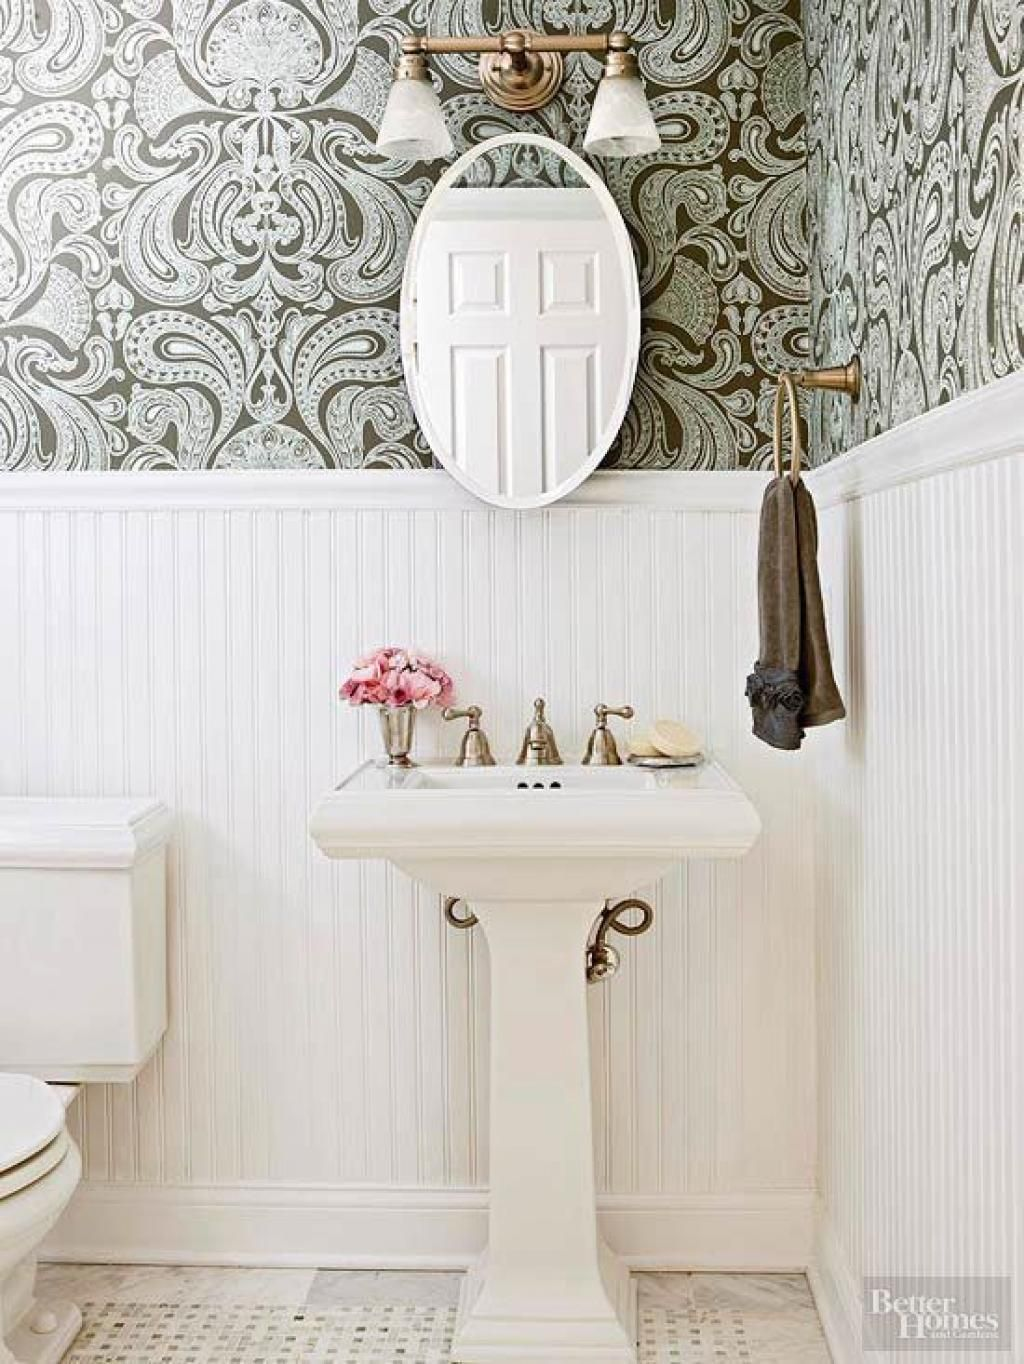 40 Stylish Bathroom Wallpaper Ideas Inspirations  Bathroom Mesmerizing Small Bathroom Wallpaper Ideas Design Ideas